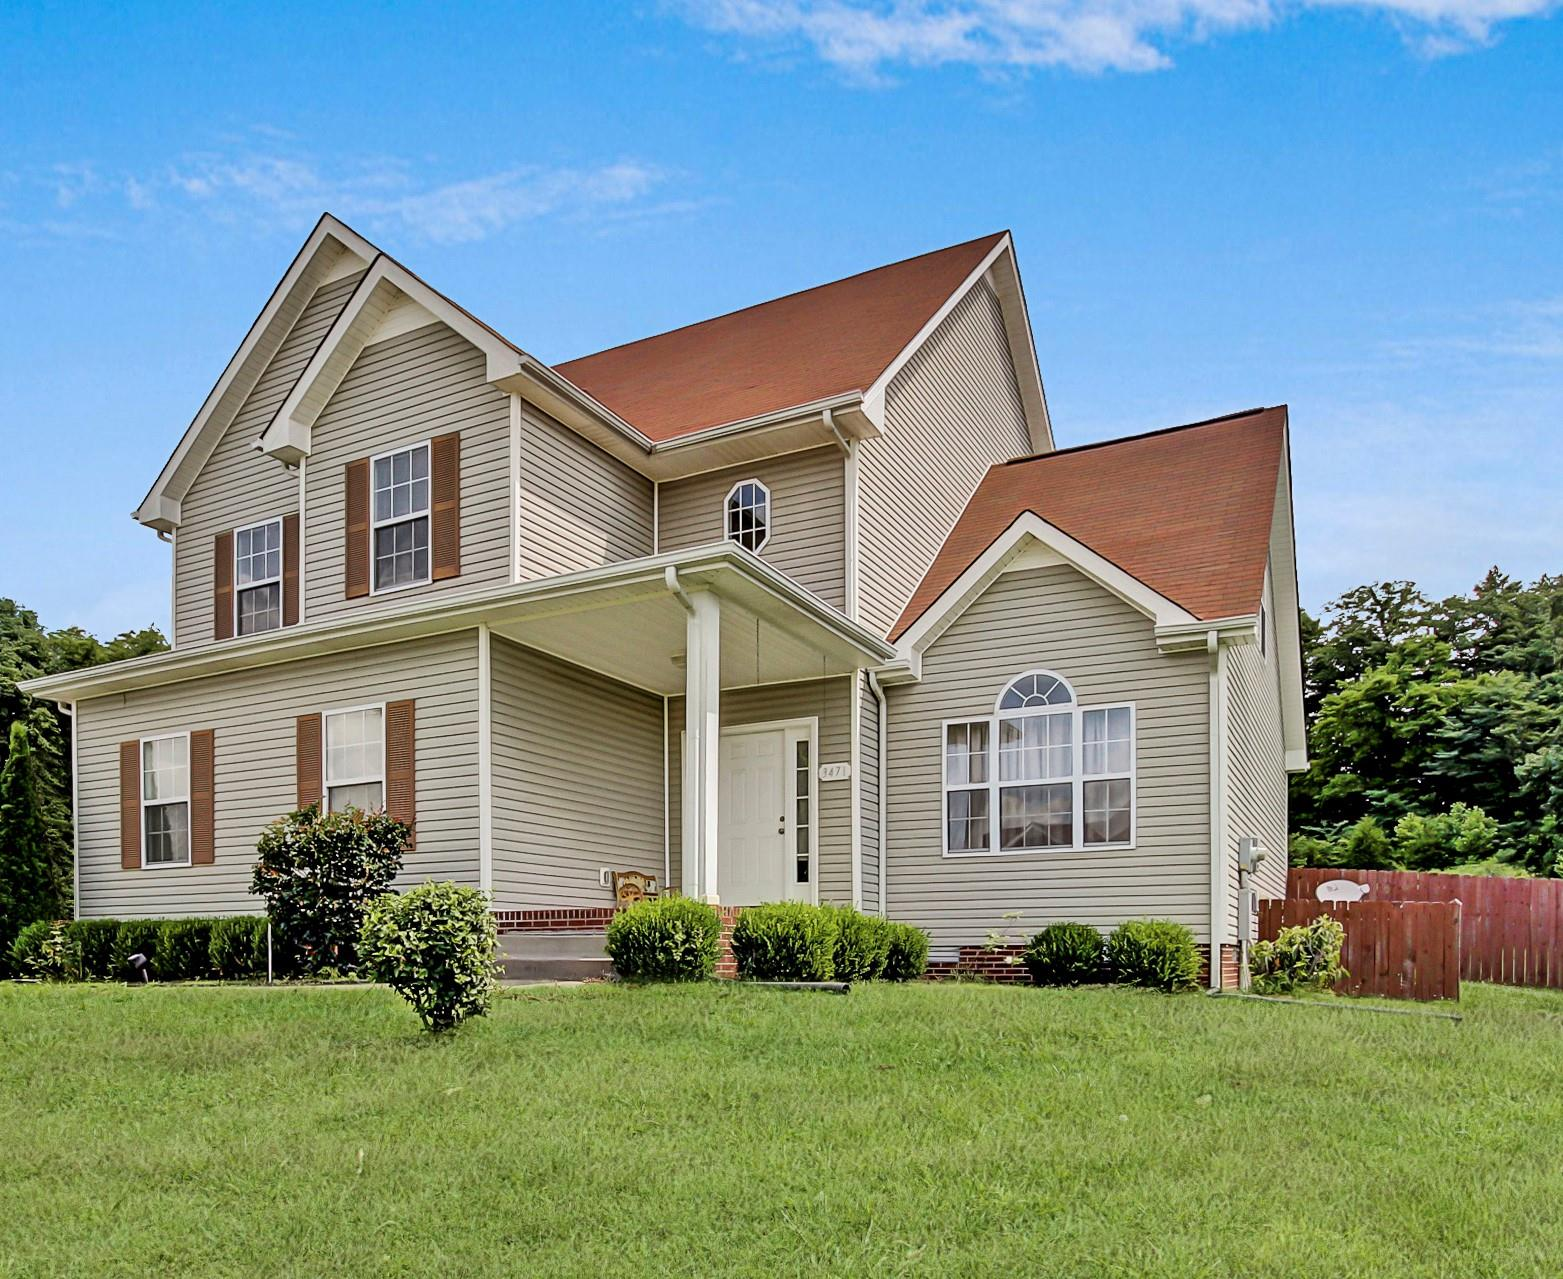 3471 Hickory Glen Dr, Clarksville, TN 37040